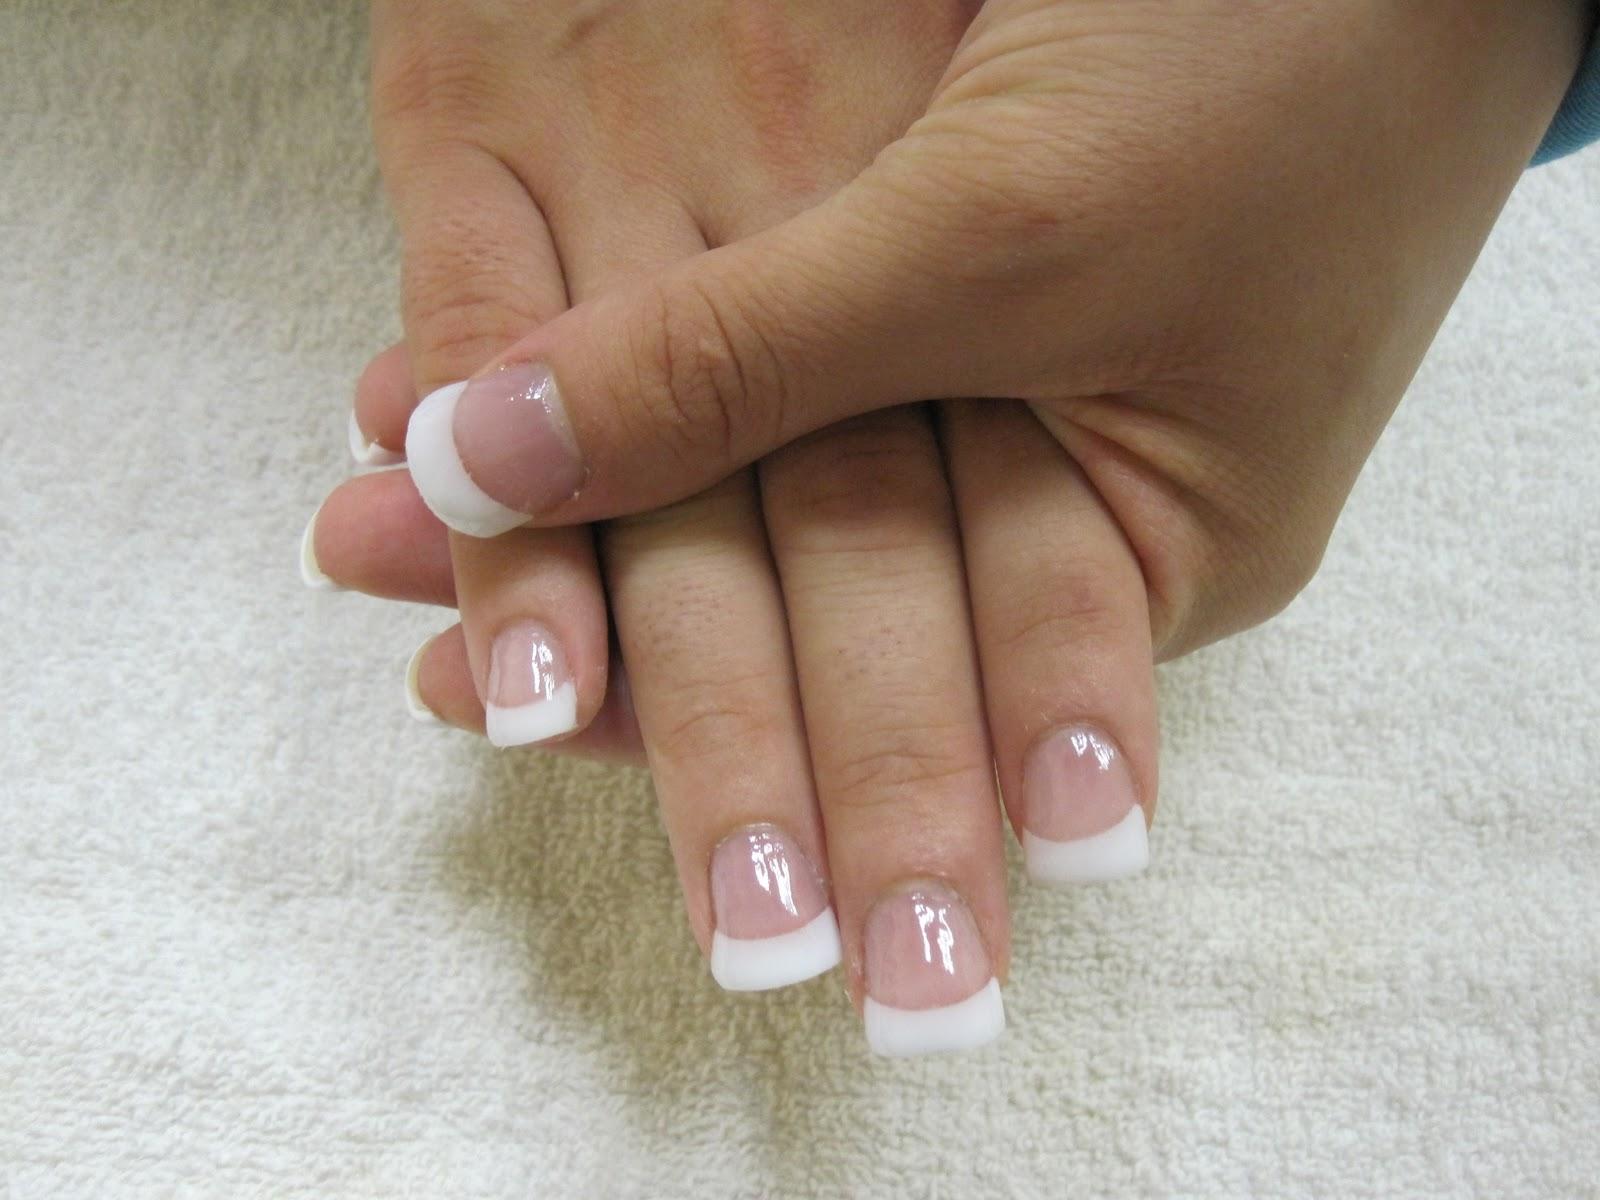 Nail Art Las Vegas: Pink and White Nails Las Vegas